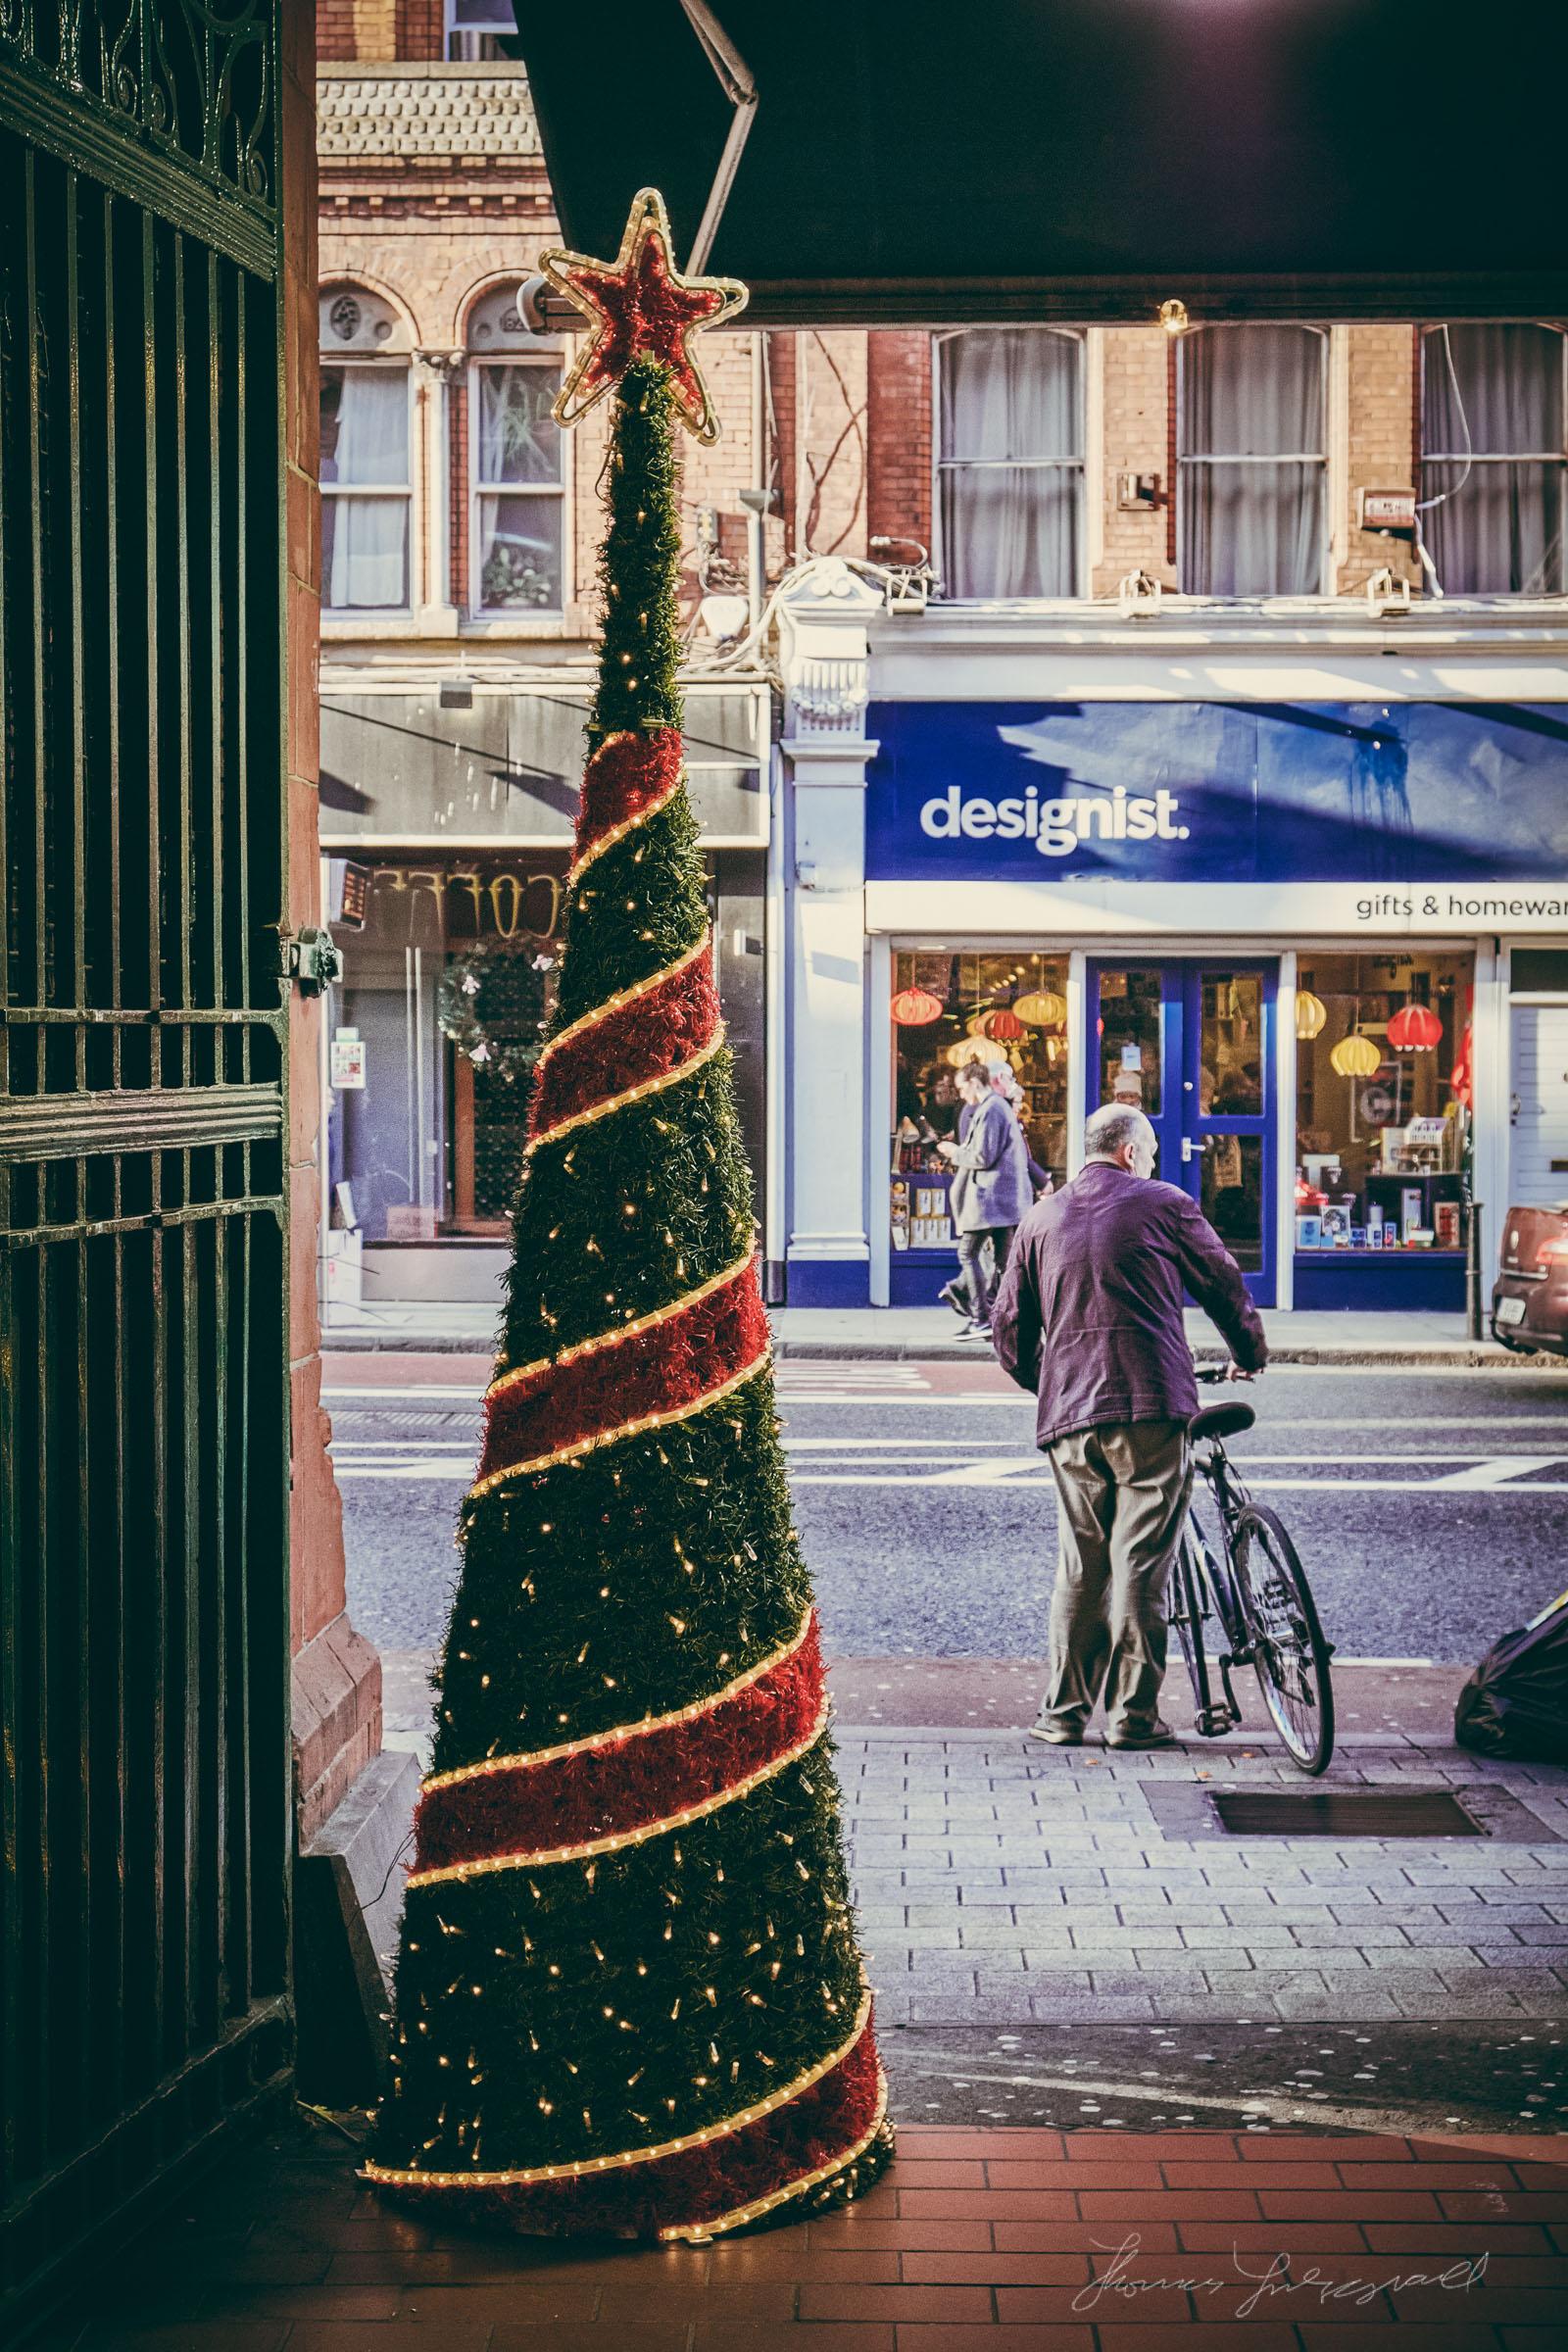 Streets-of-Dublin-Photo-1356.jpg